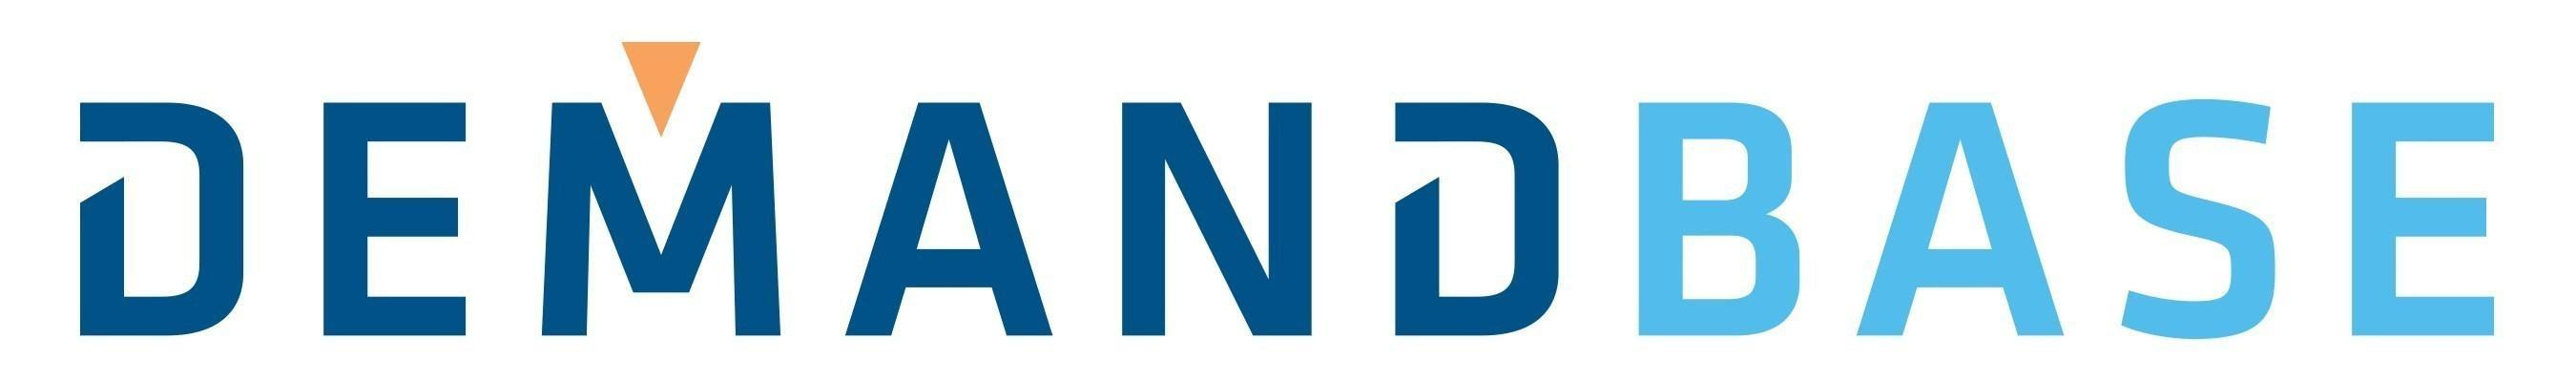 Demandbase company logo